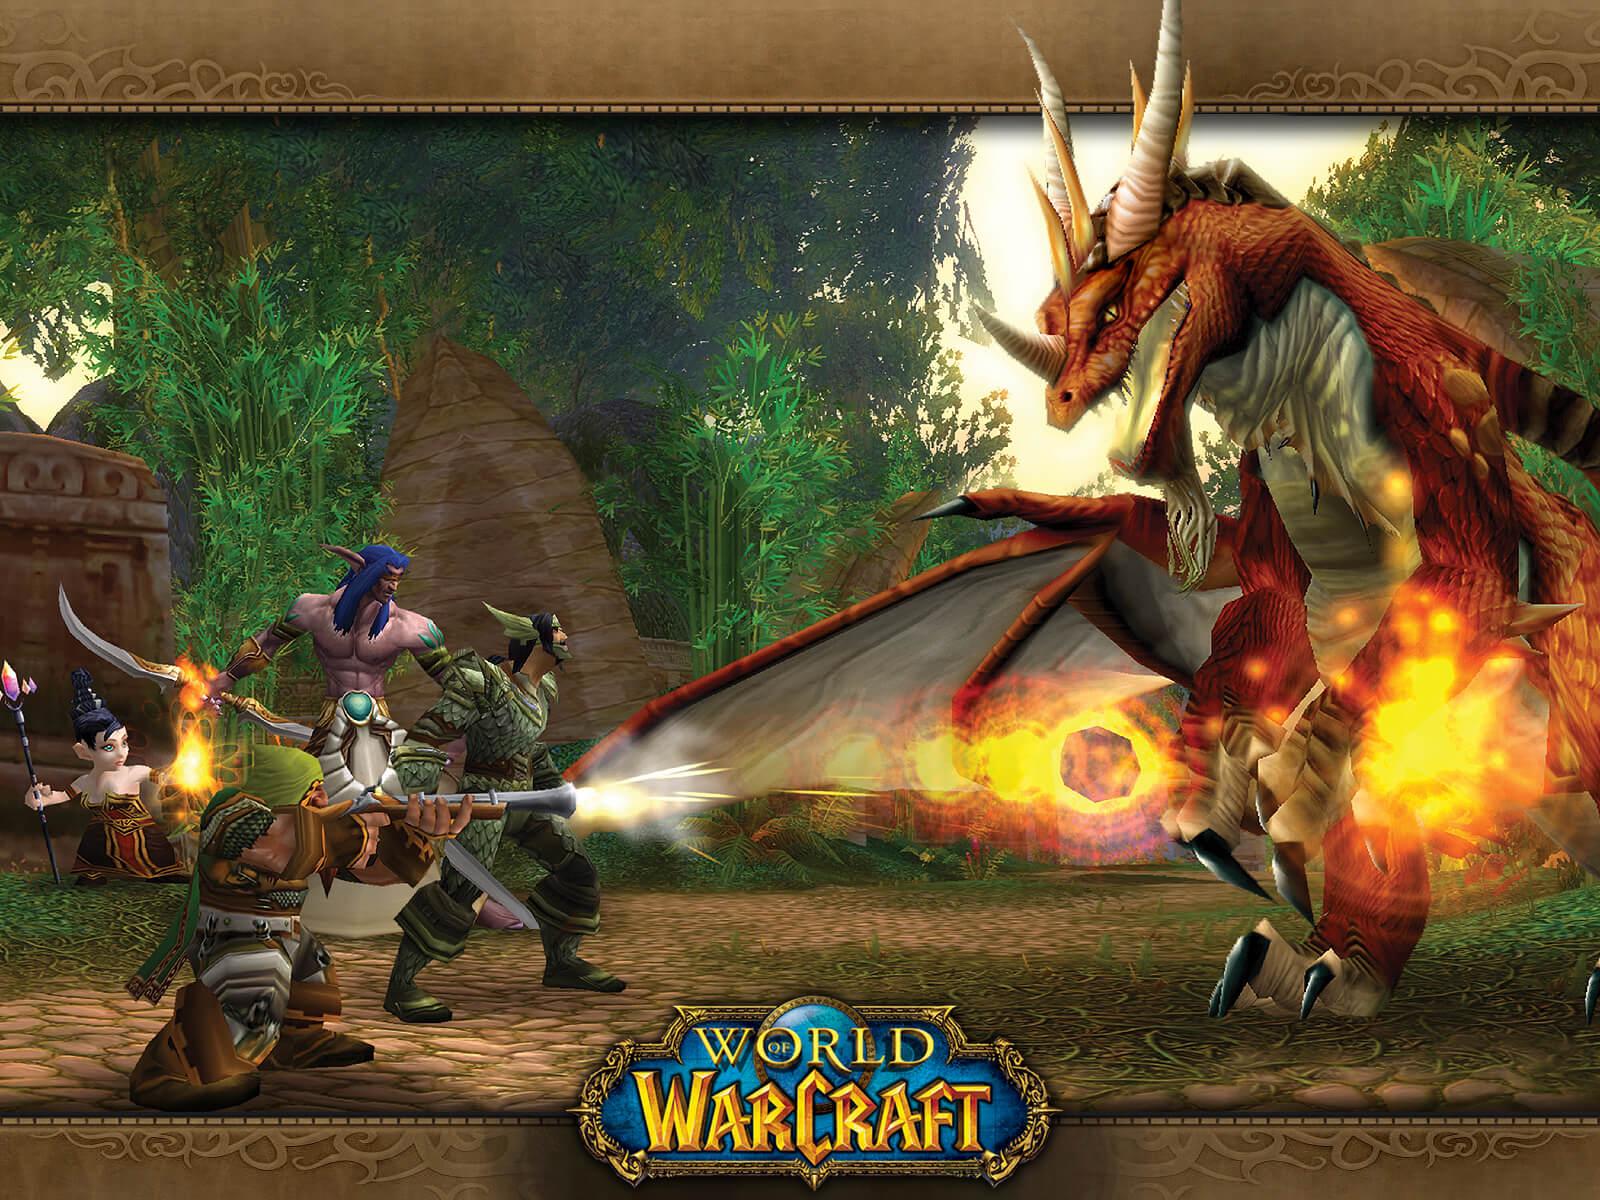 World of Warcraft Classic - Original Art